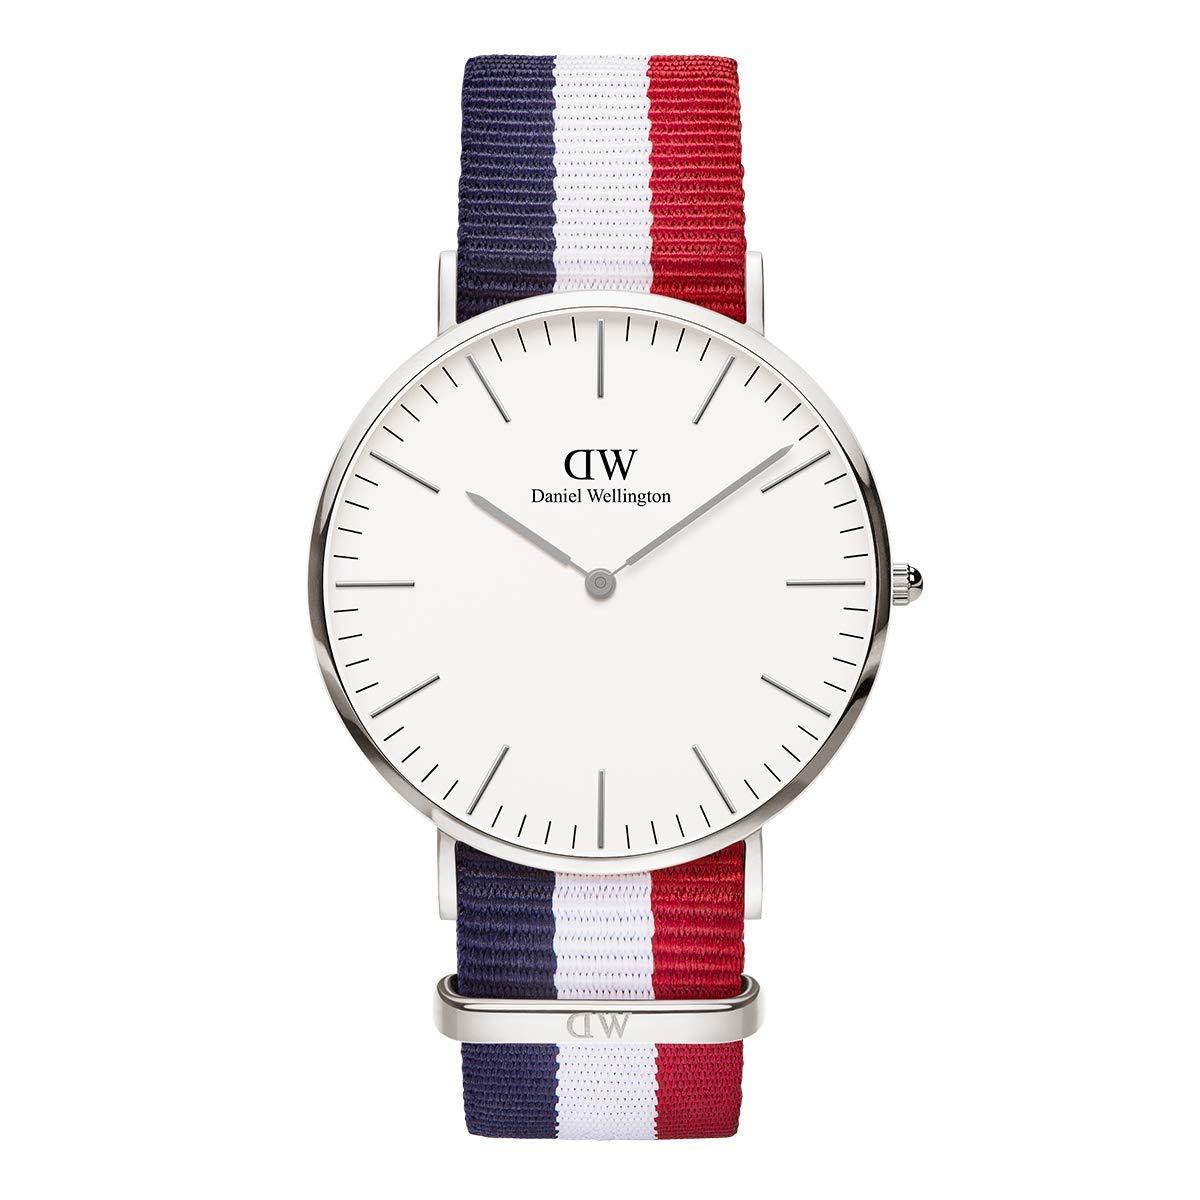 Daniel Wellington Trenduhren  Classic Cambridge, Blau-Weiß-Rot/Roségold Uhr, 40mm, NATO, für Herren